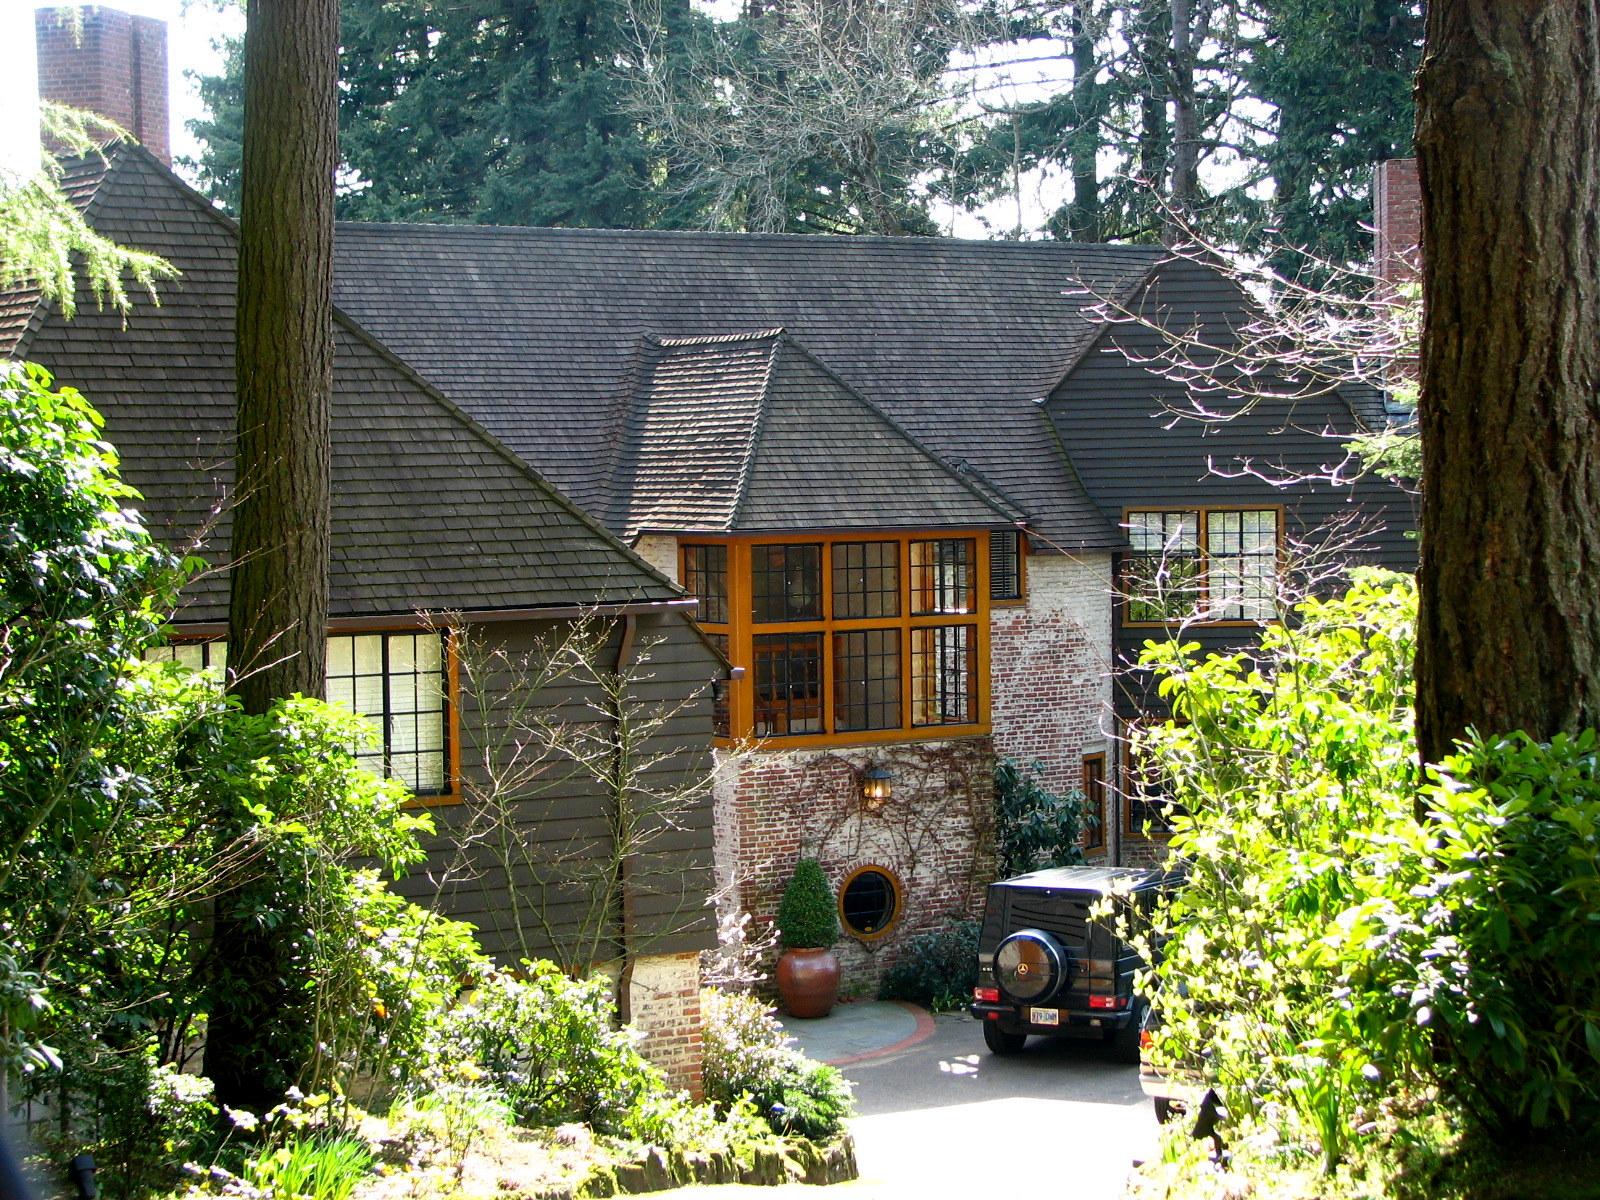 File kistner house portland wikipedia for Building a home in oregon